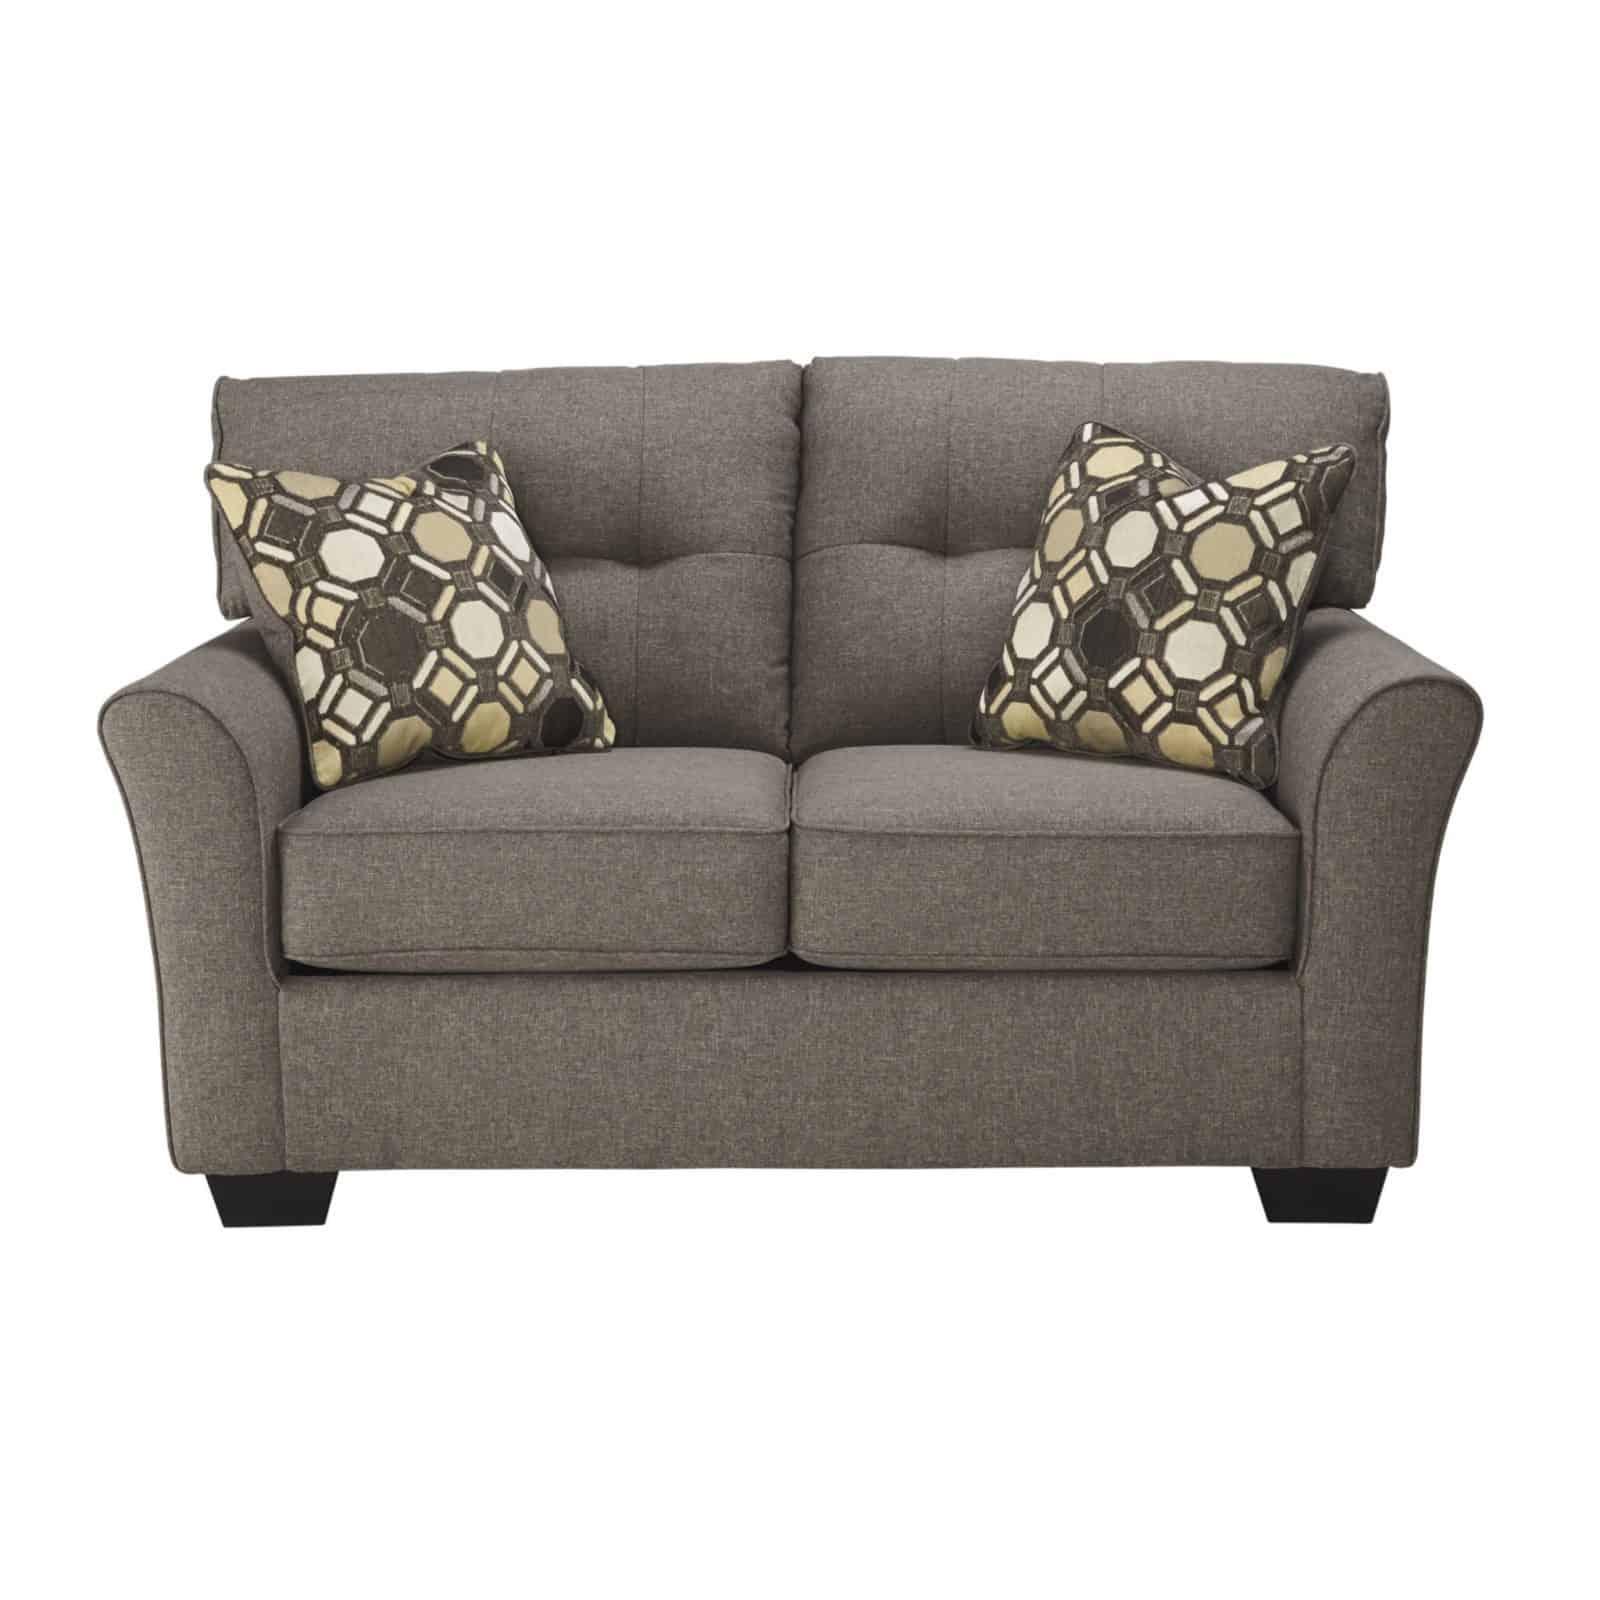 Ashley Furniture Tibbee Loveseat